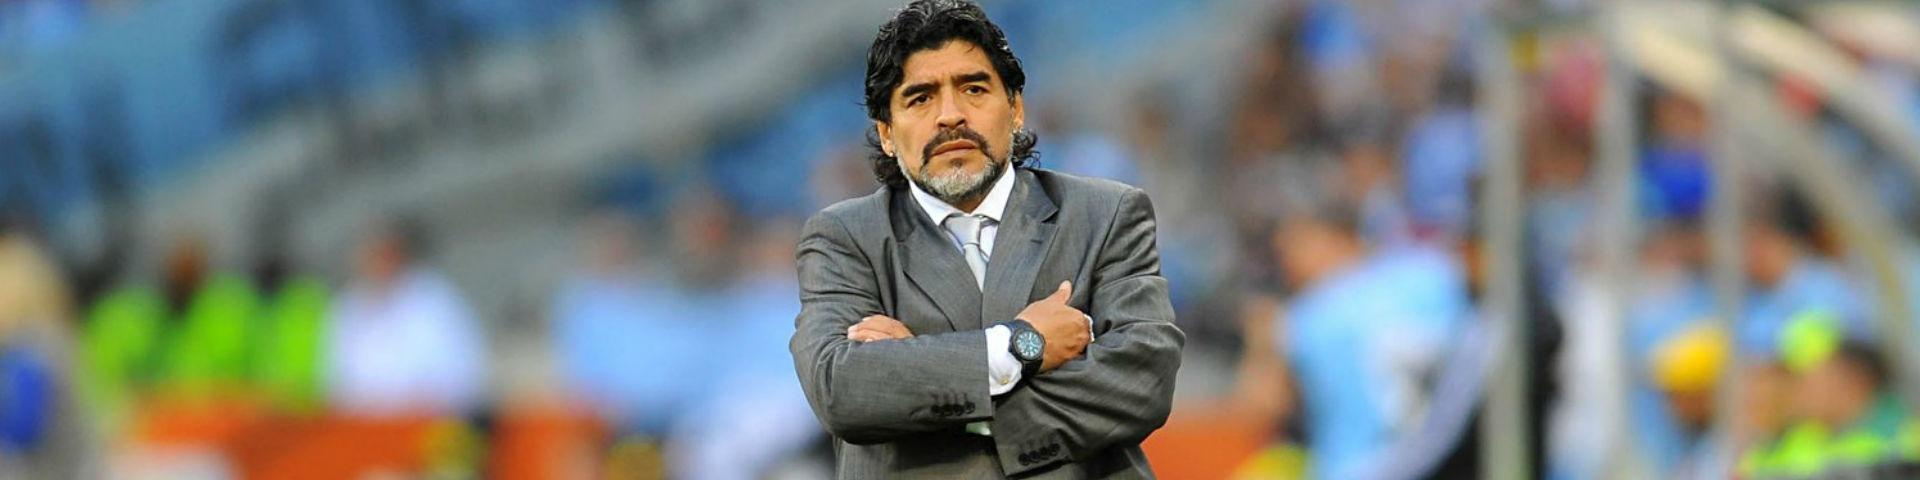 Марадона может уйти из «Химнасии» из-за президента клуба